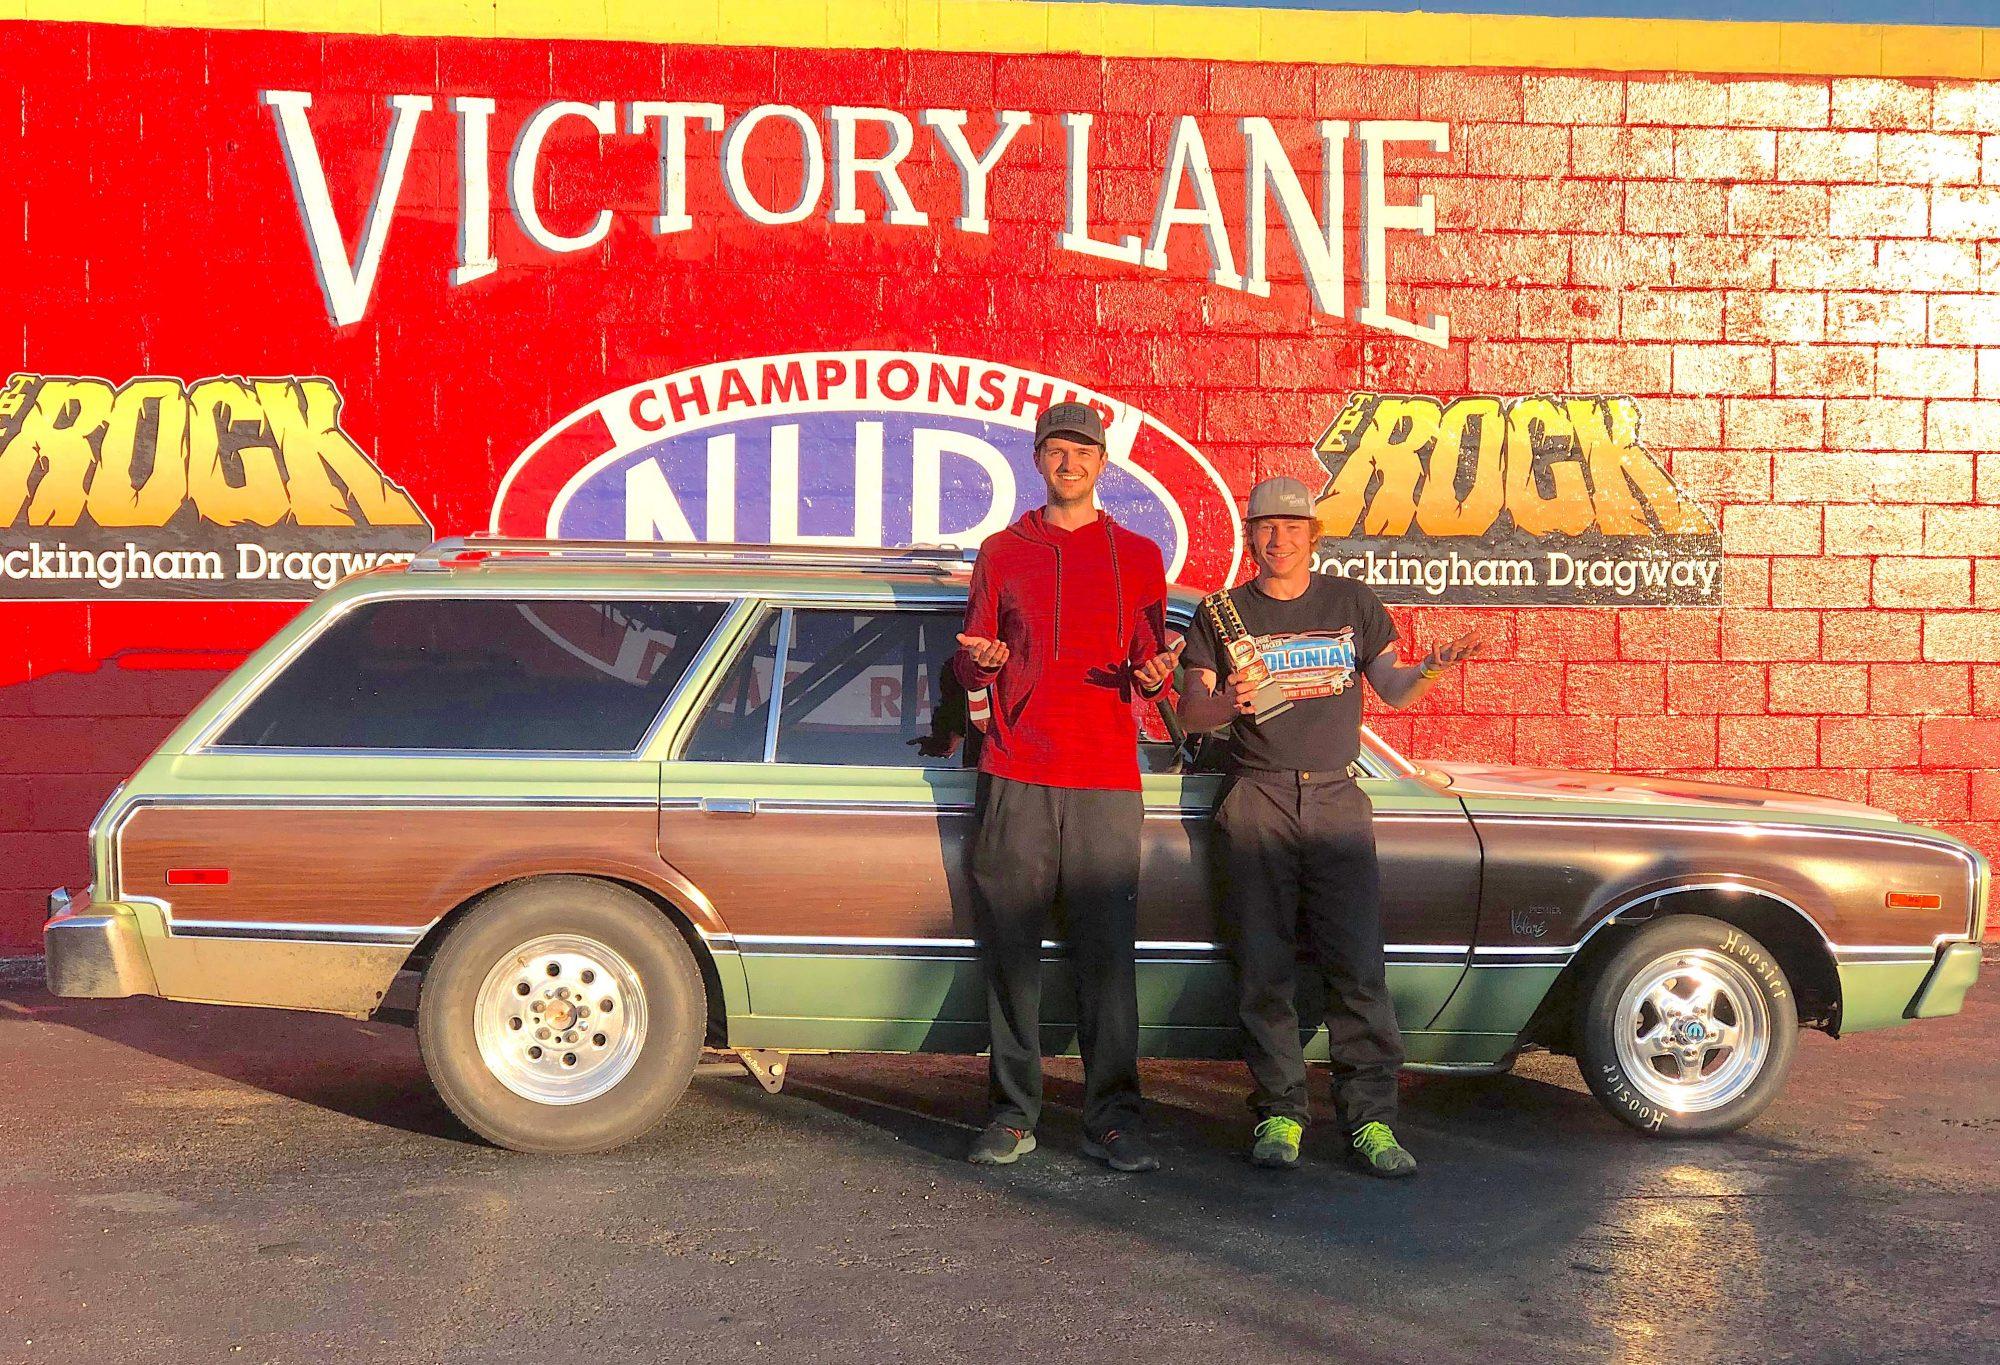 2 men standing next to a race car